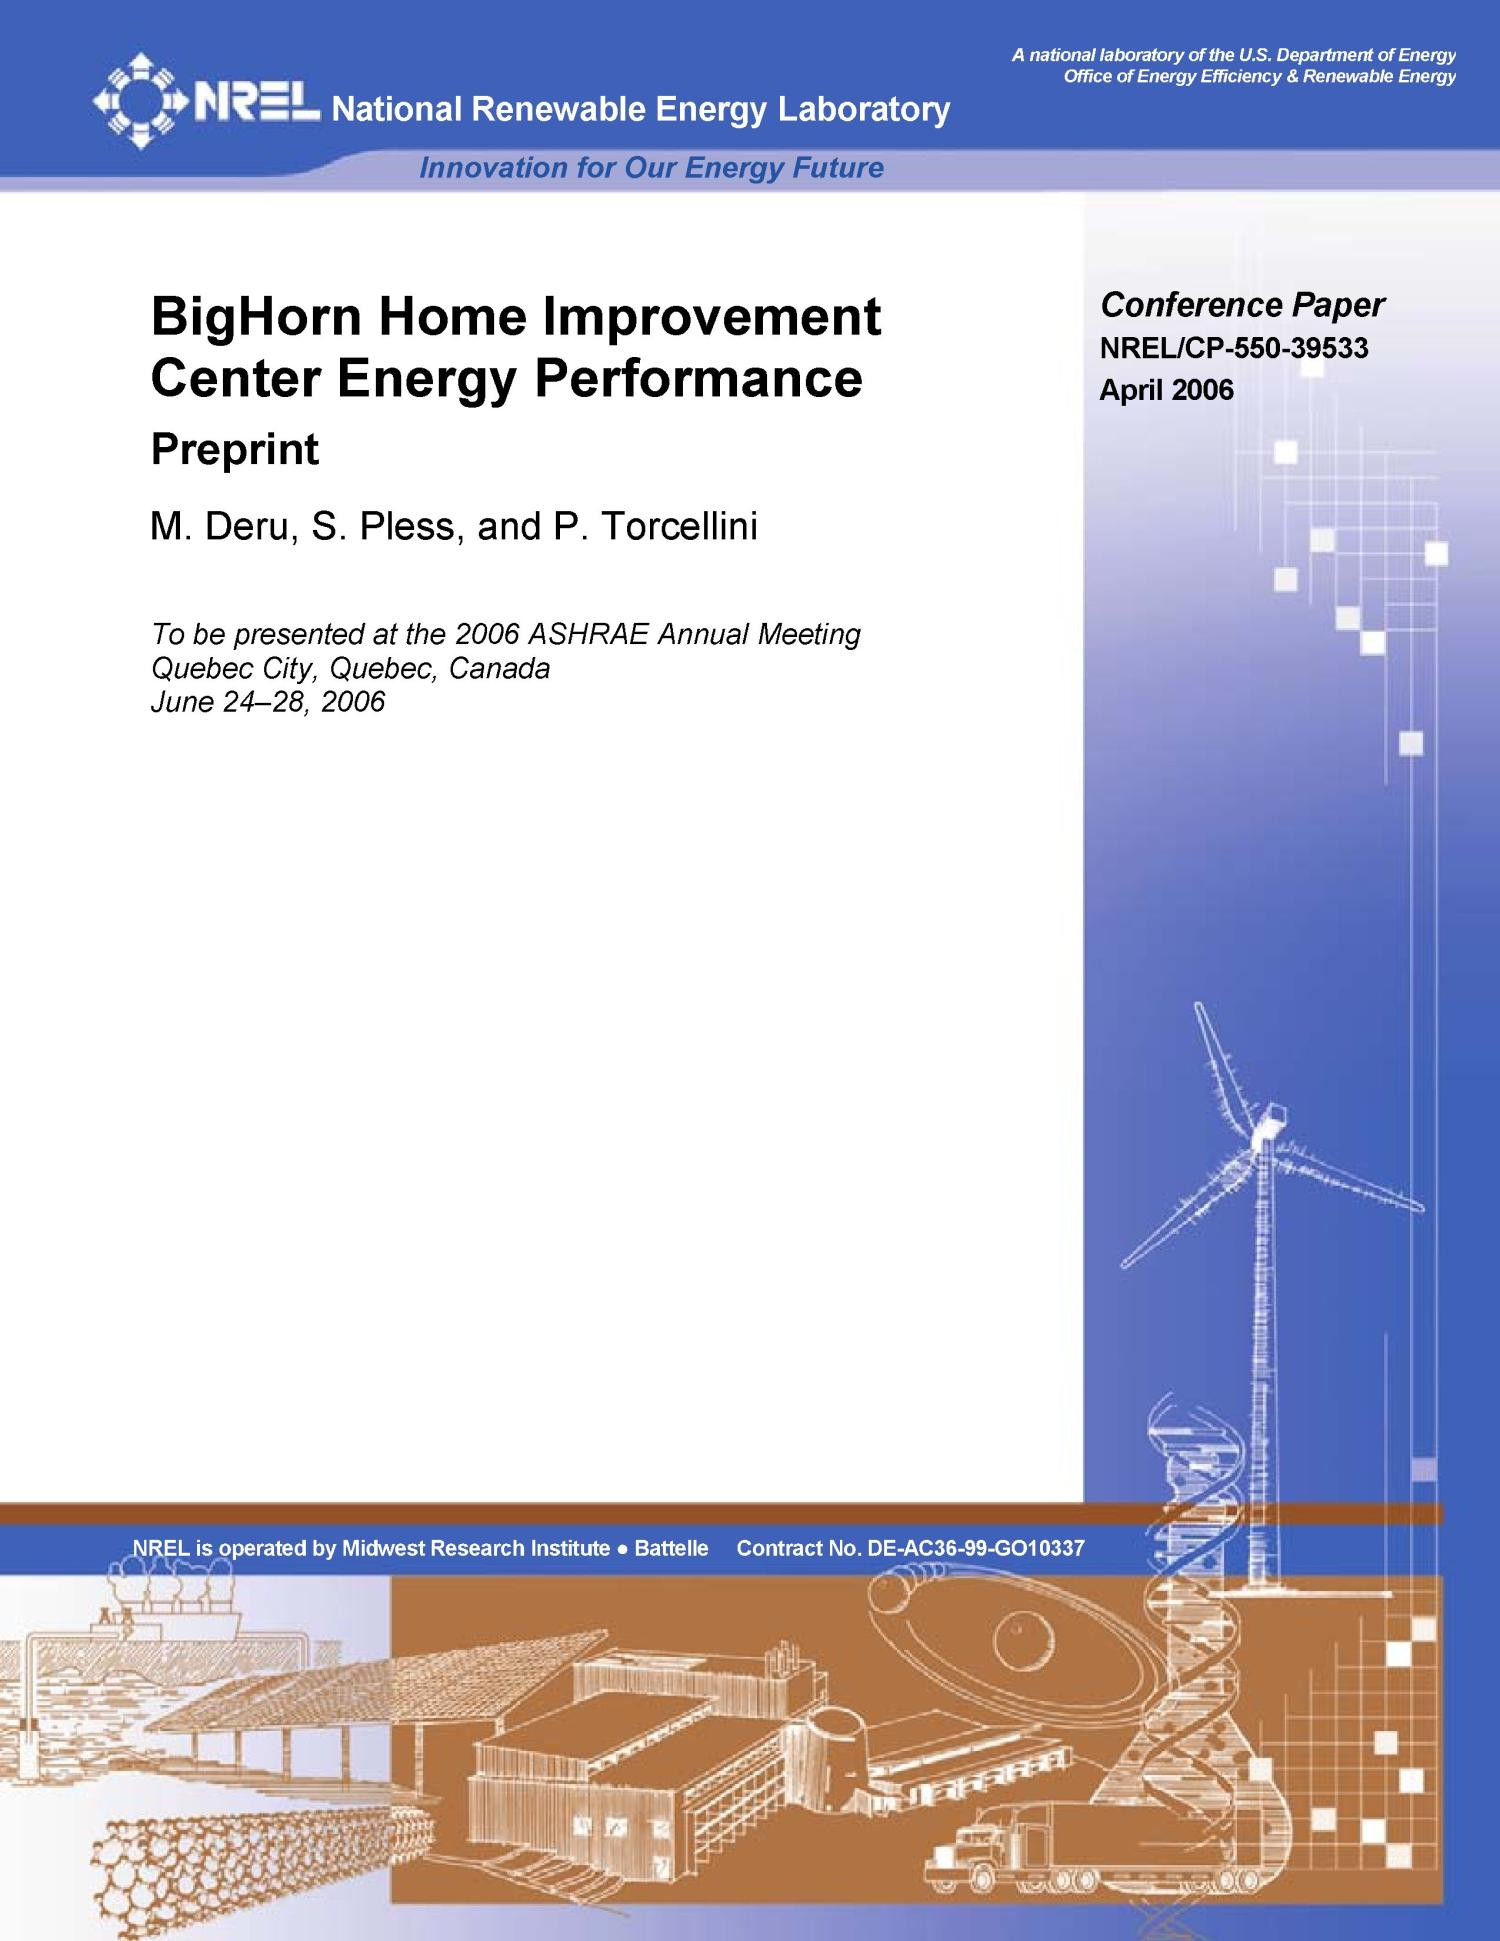 Bighorn Home Improvement Center Energy Performance Preprint Unt Digital Library